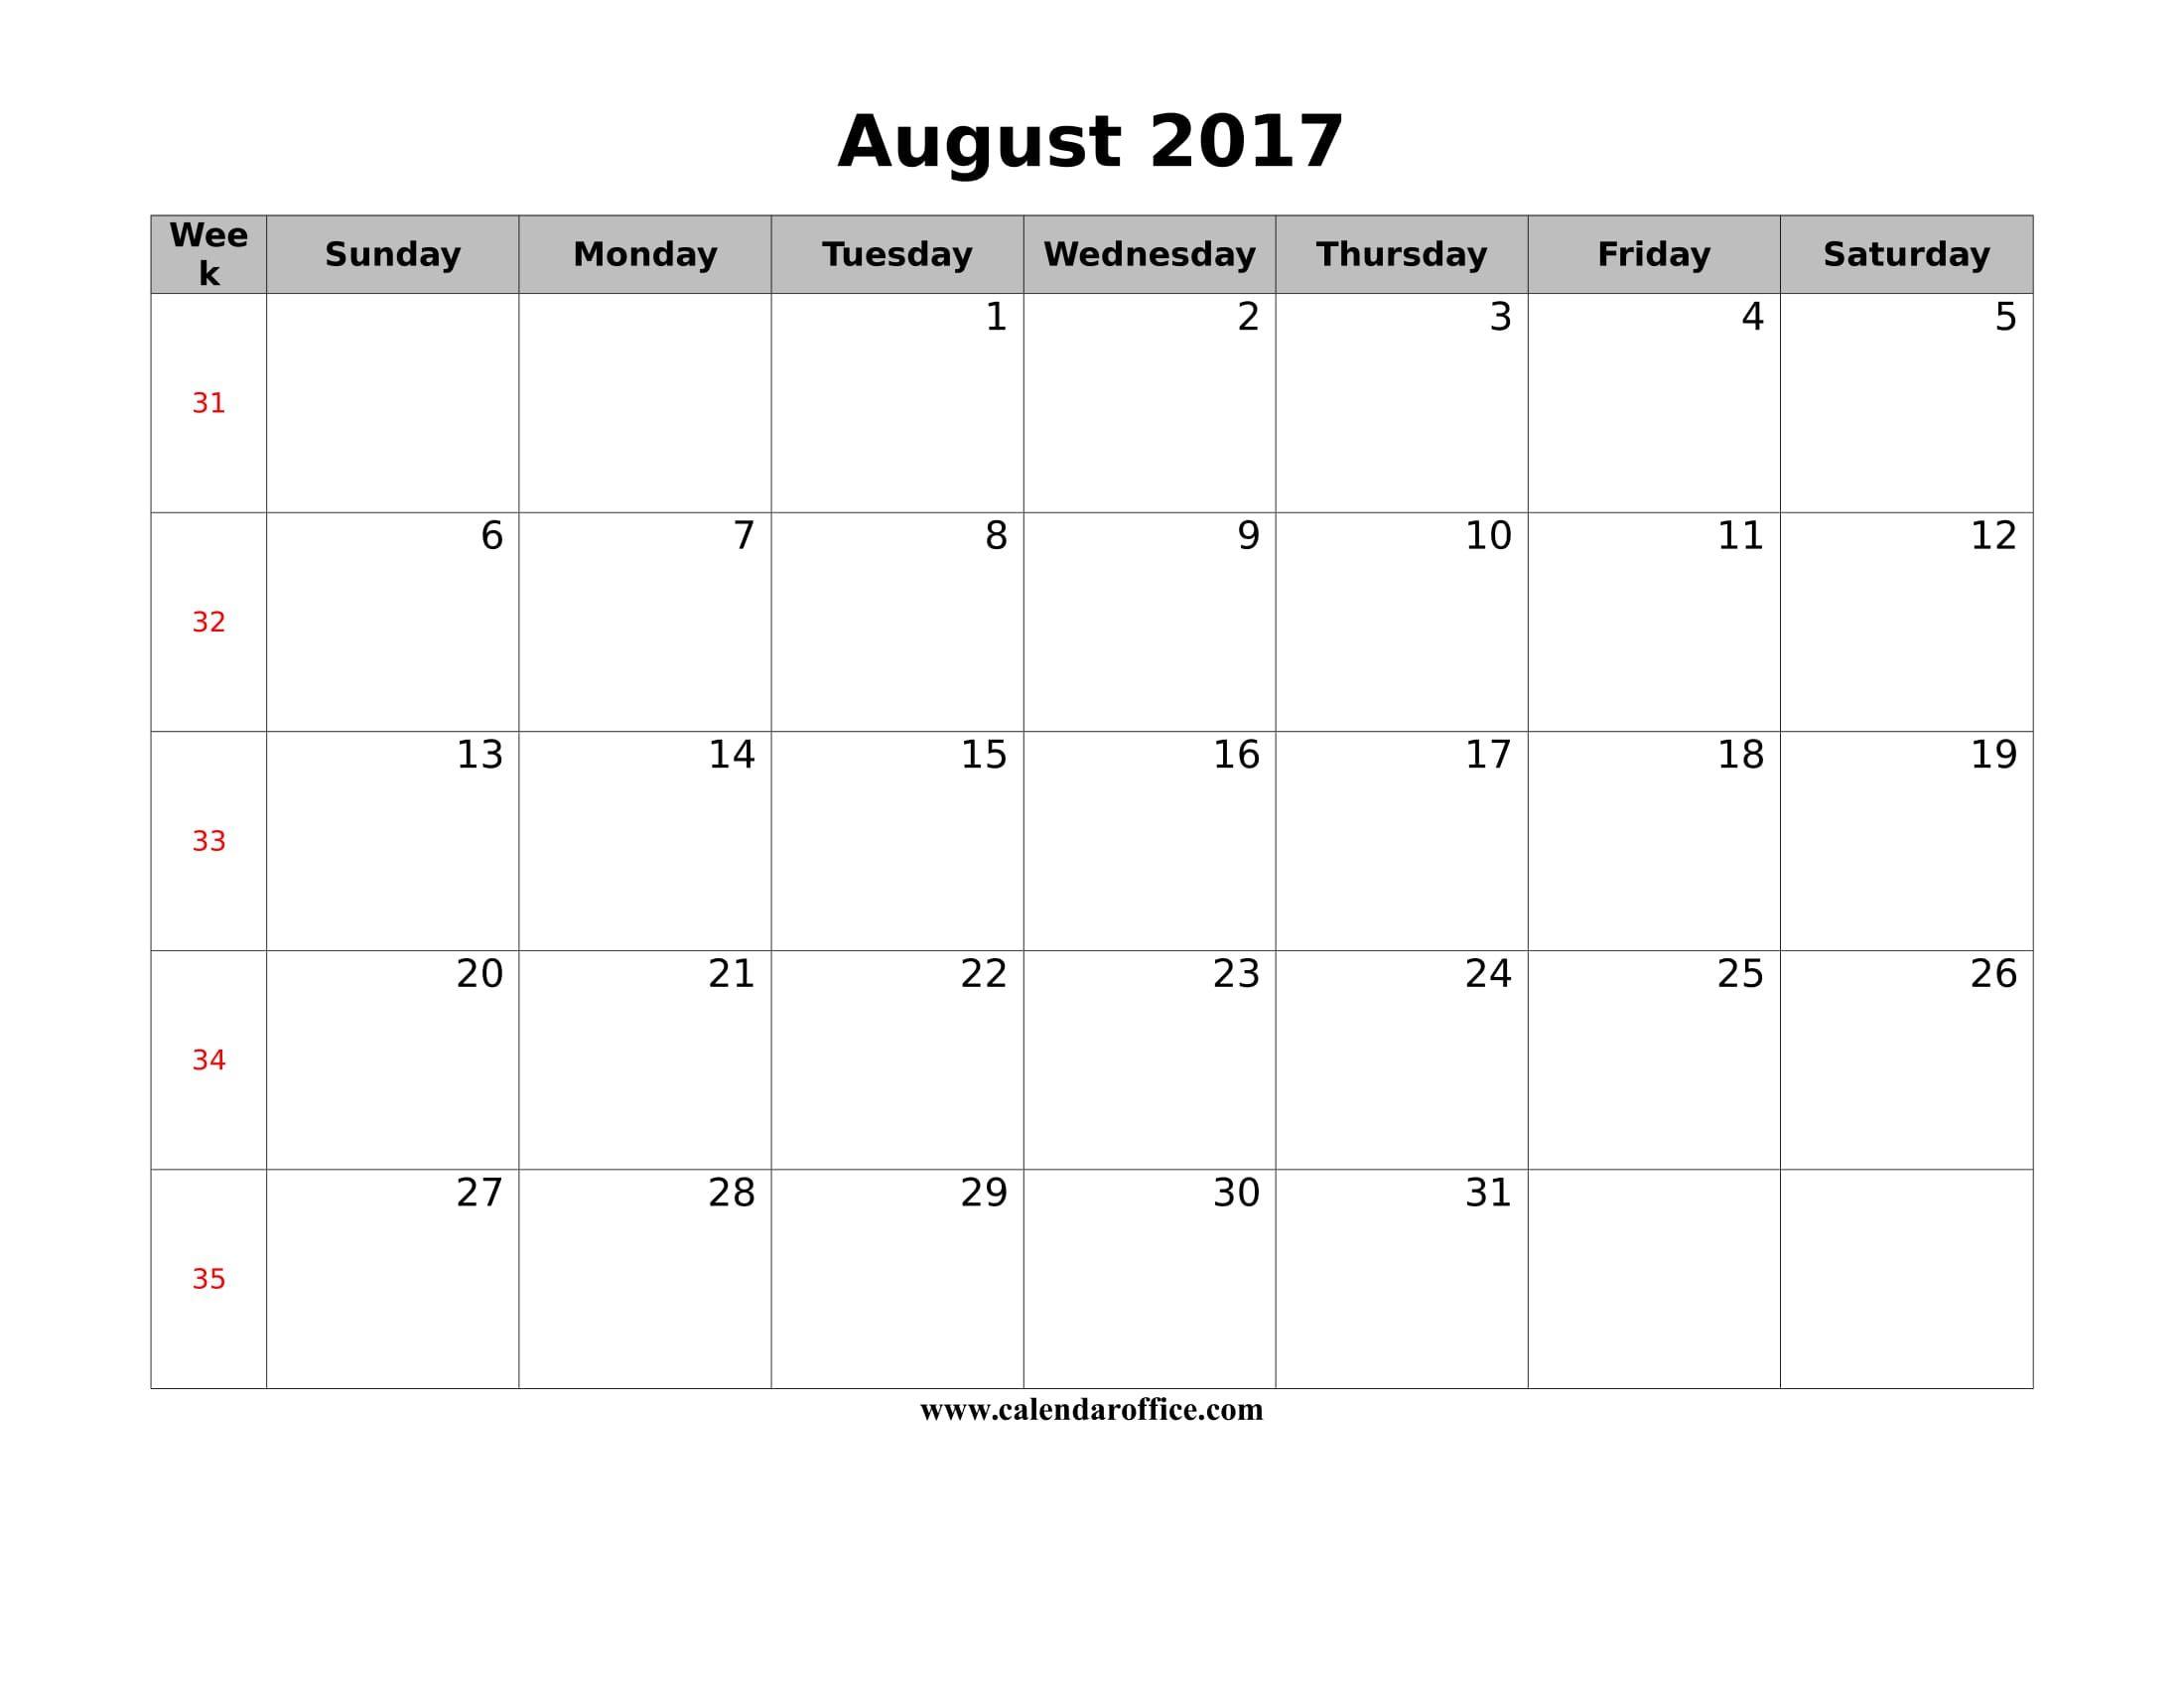 August 2017 Calendar Free Printable | August 2017 Calendar | Pinterest - Free Printable August 2017